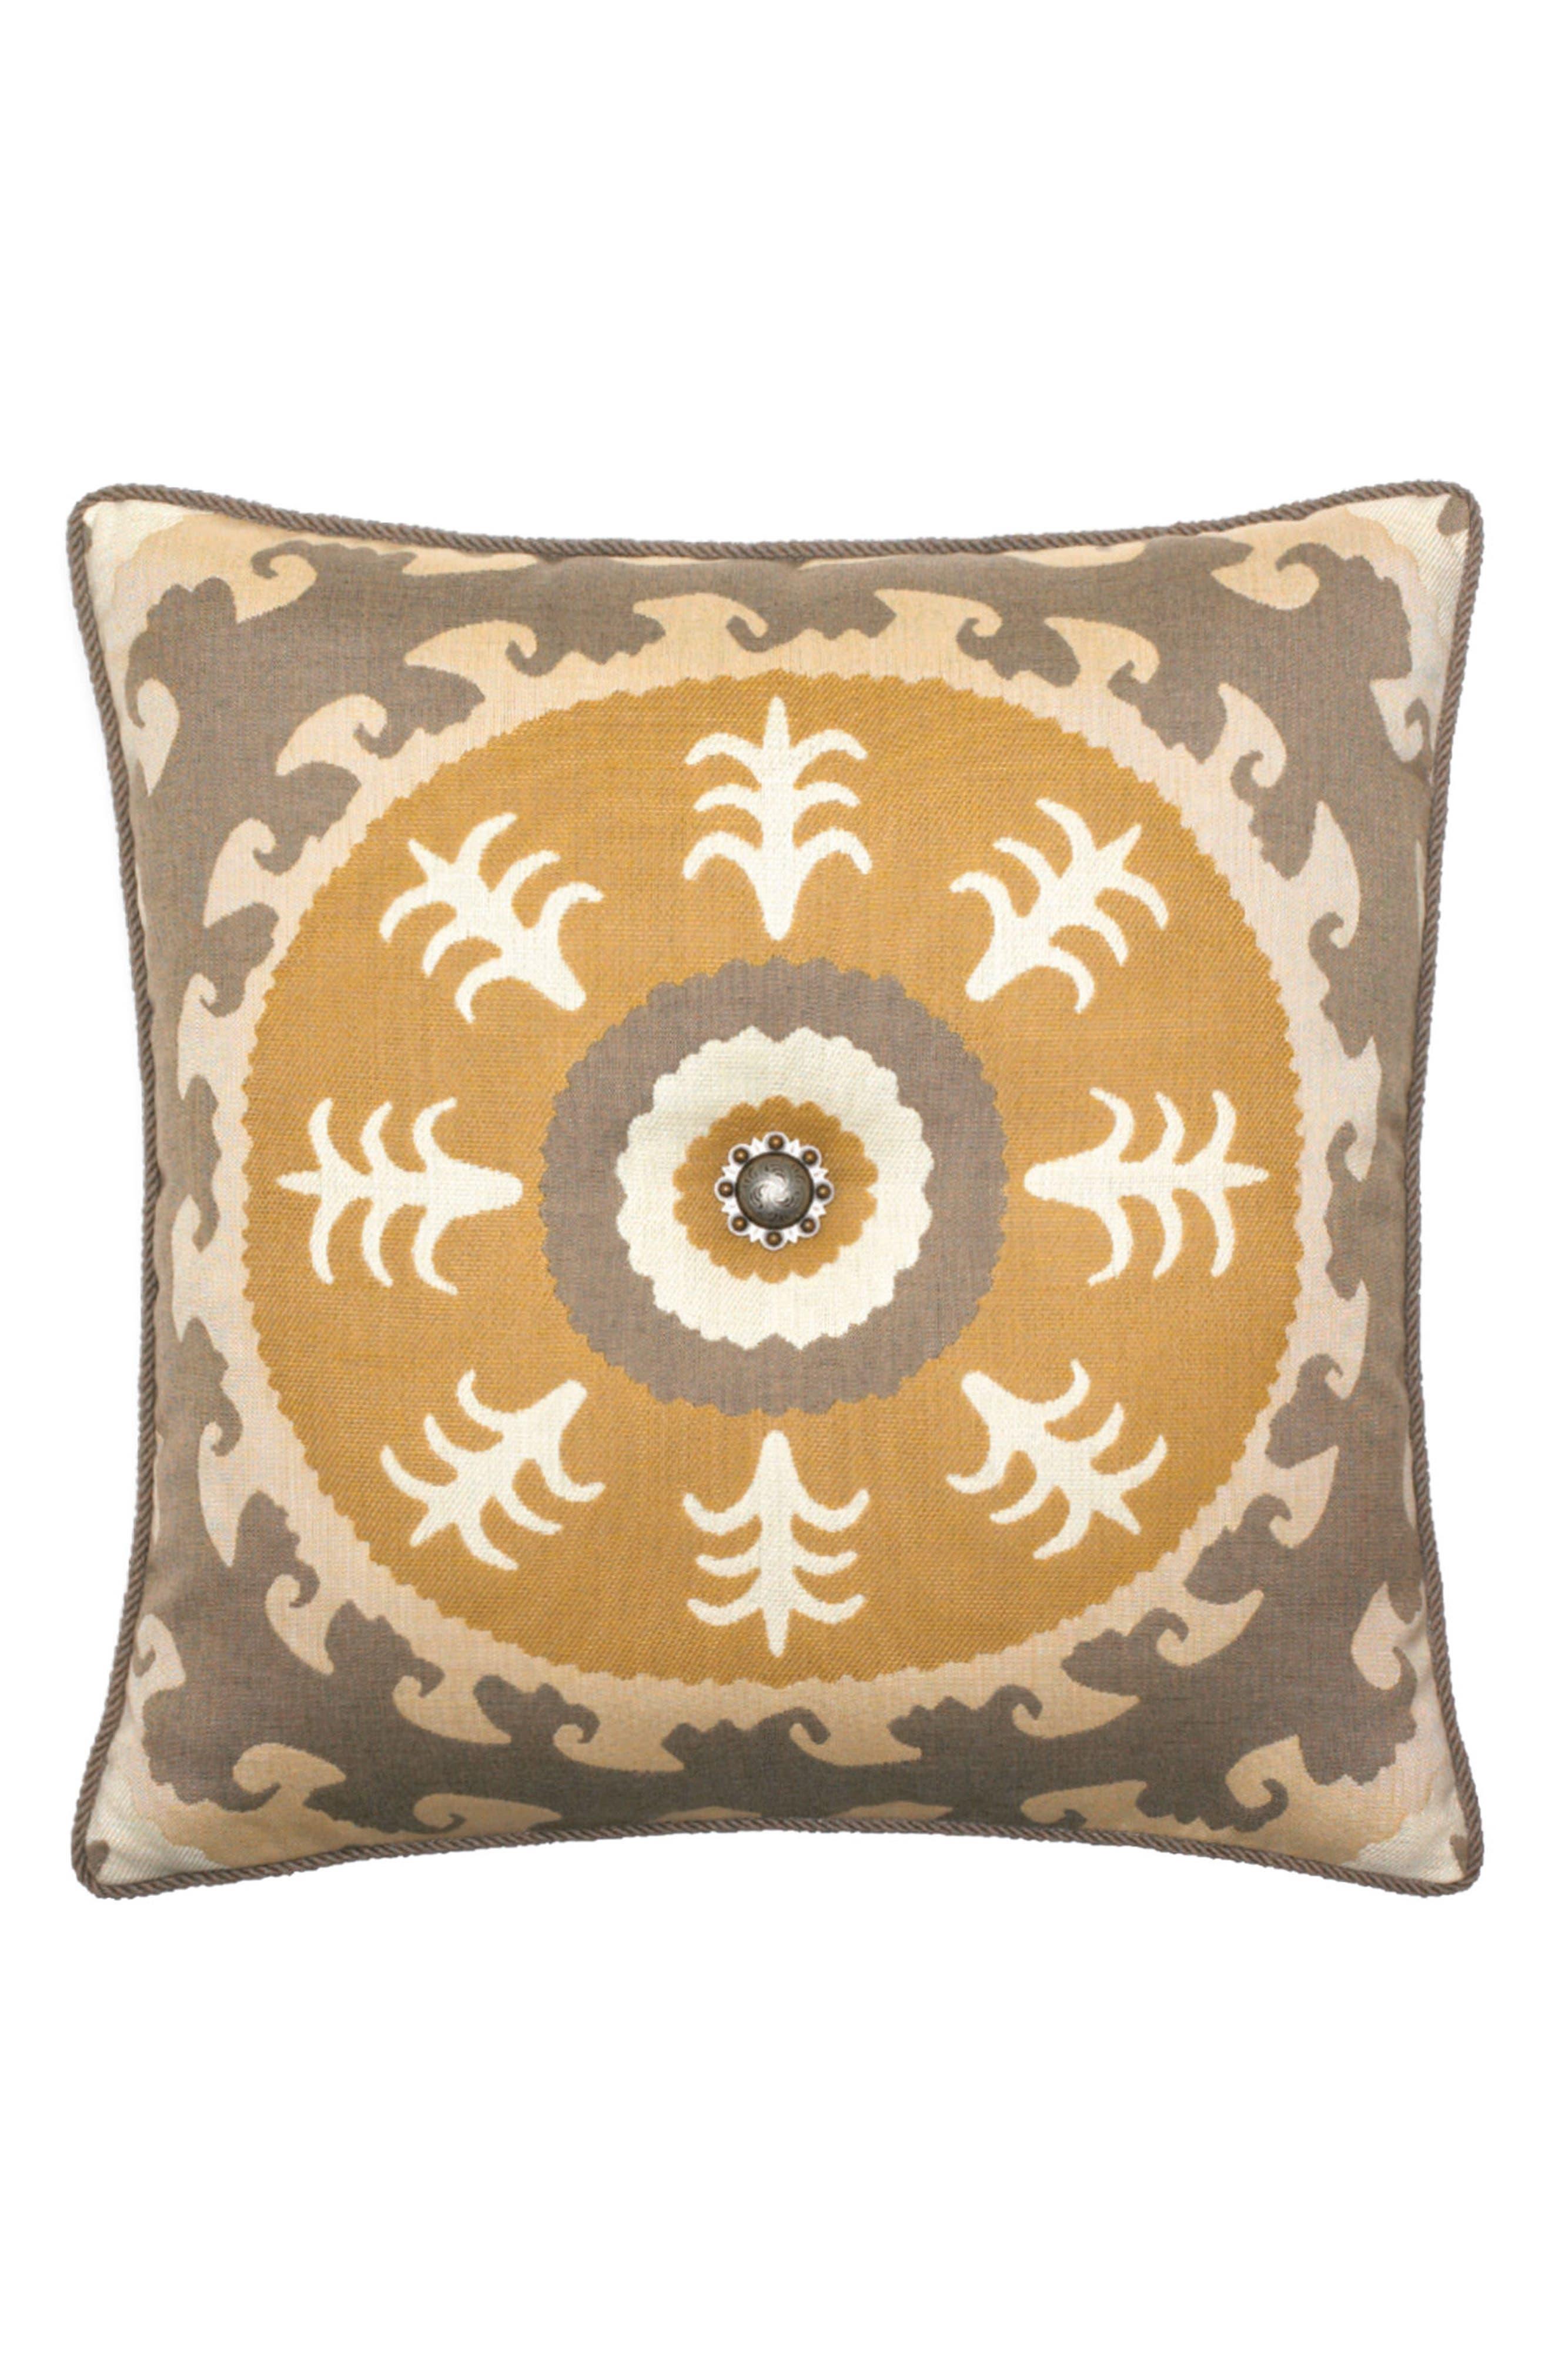 Jeweled Sedona Sun Indoor/Outdoor Accent Pillow,                         Main,                         color, GOLD/ GREY